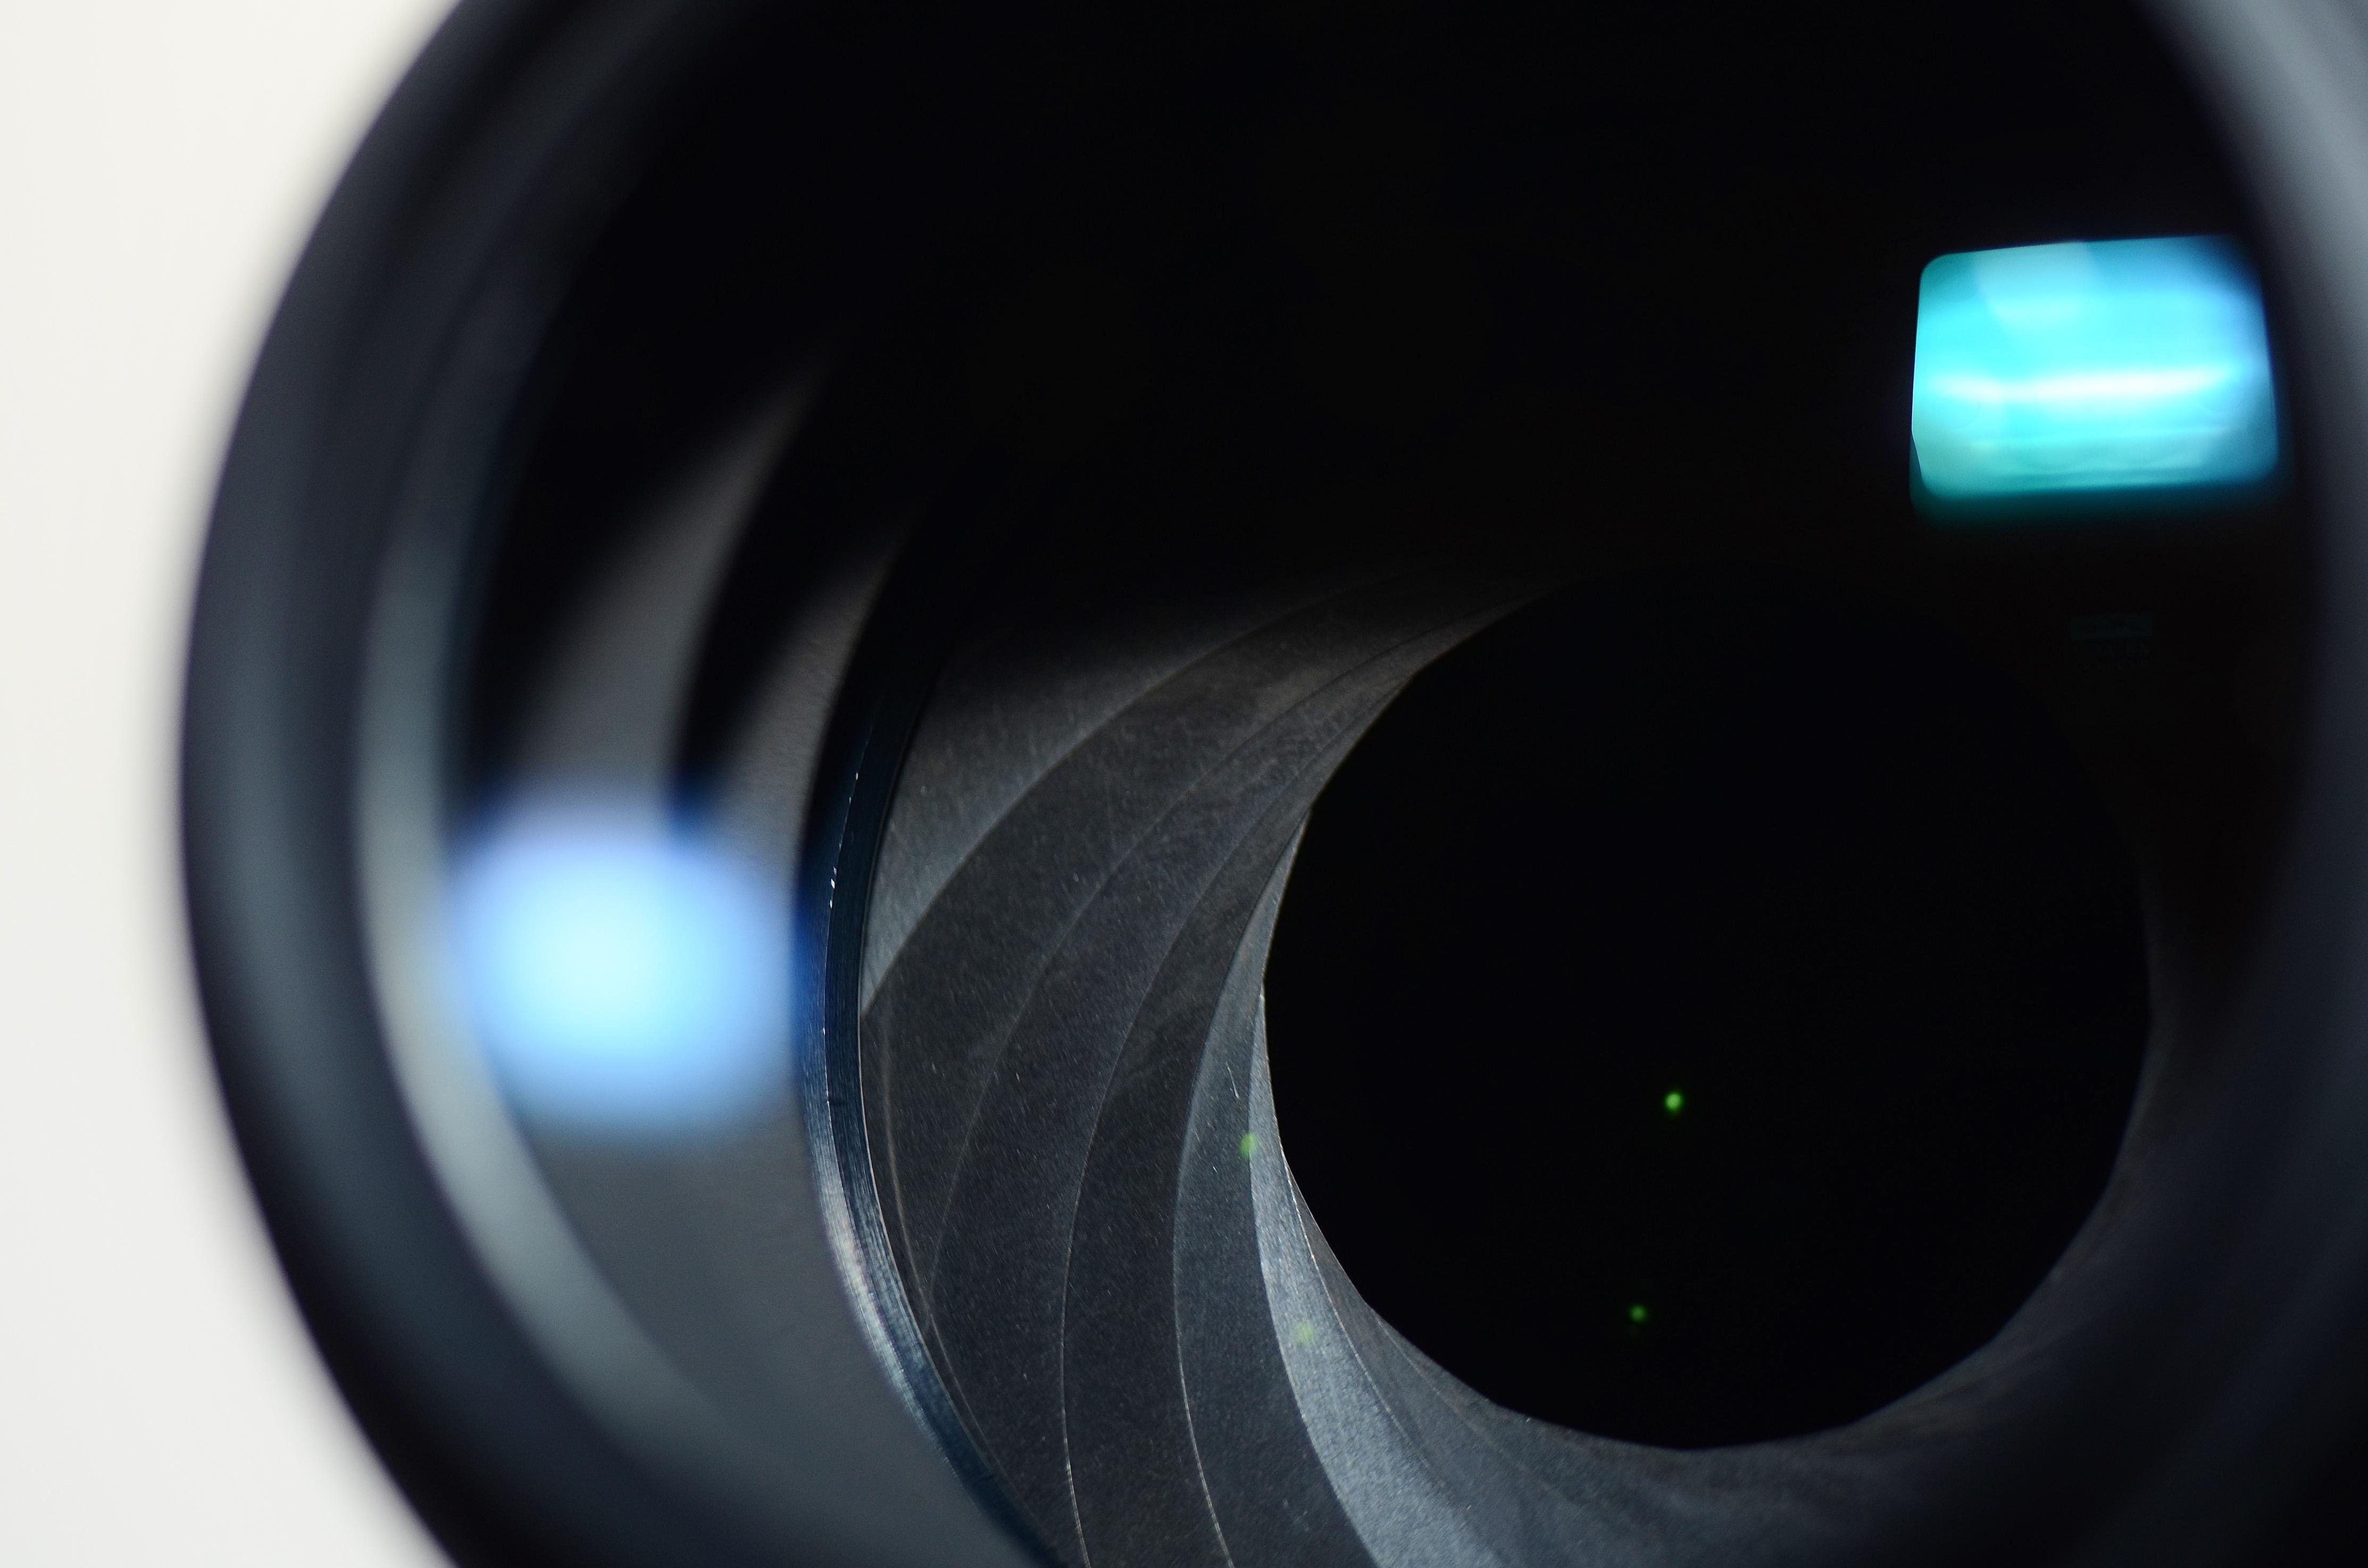 Lens Closeup, Photography, Object, Lens, Closeup, HQ Photo